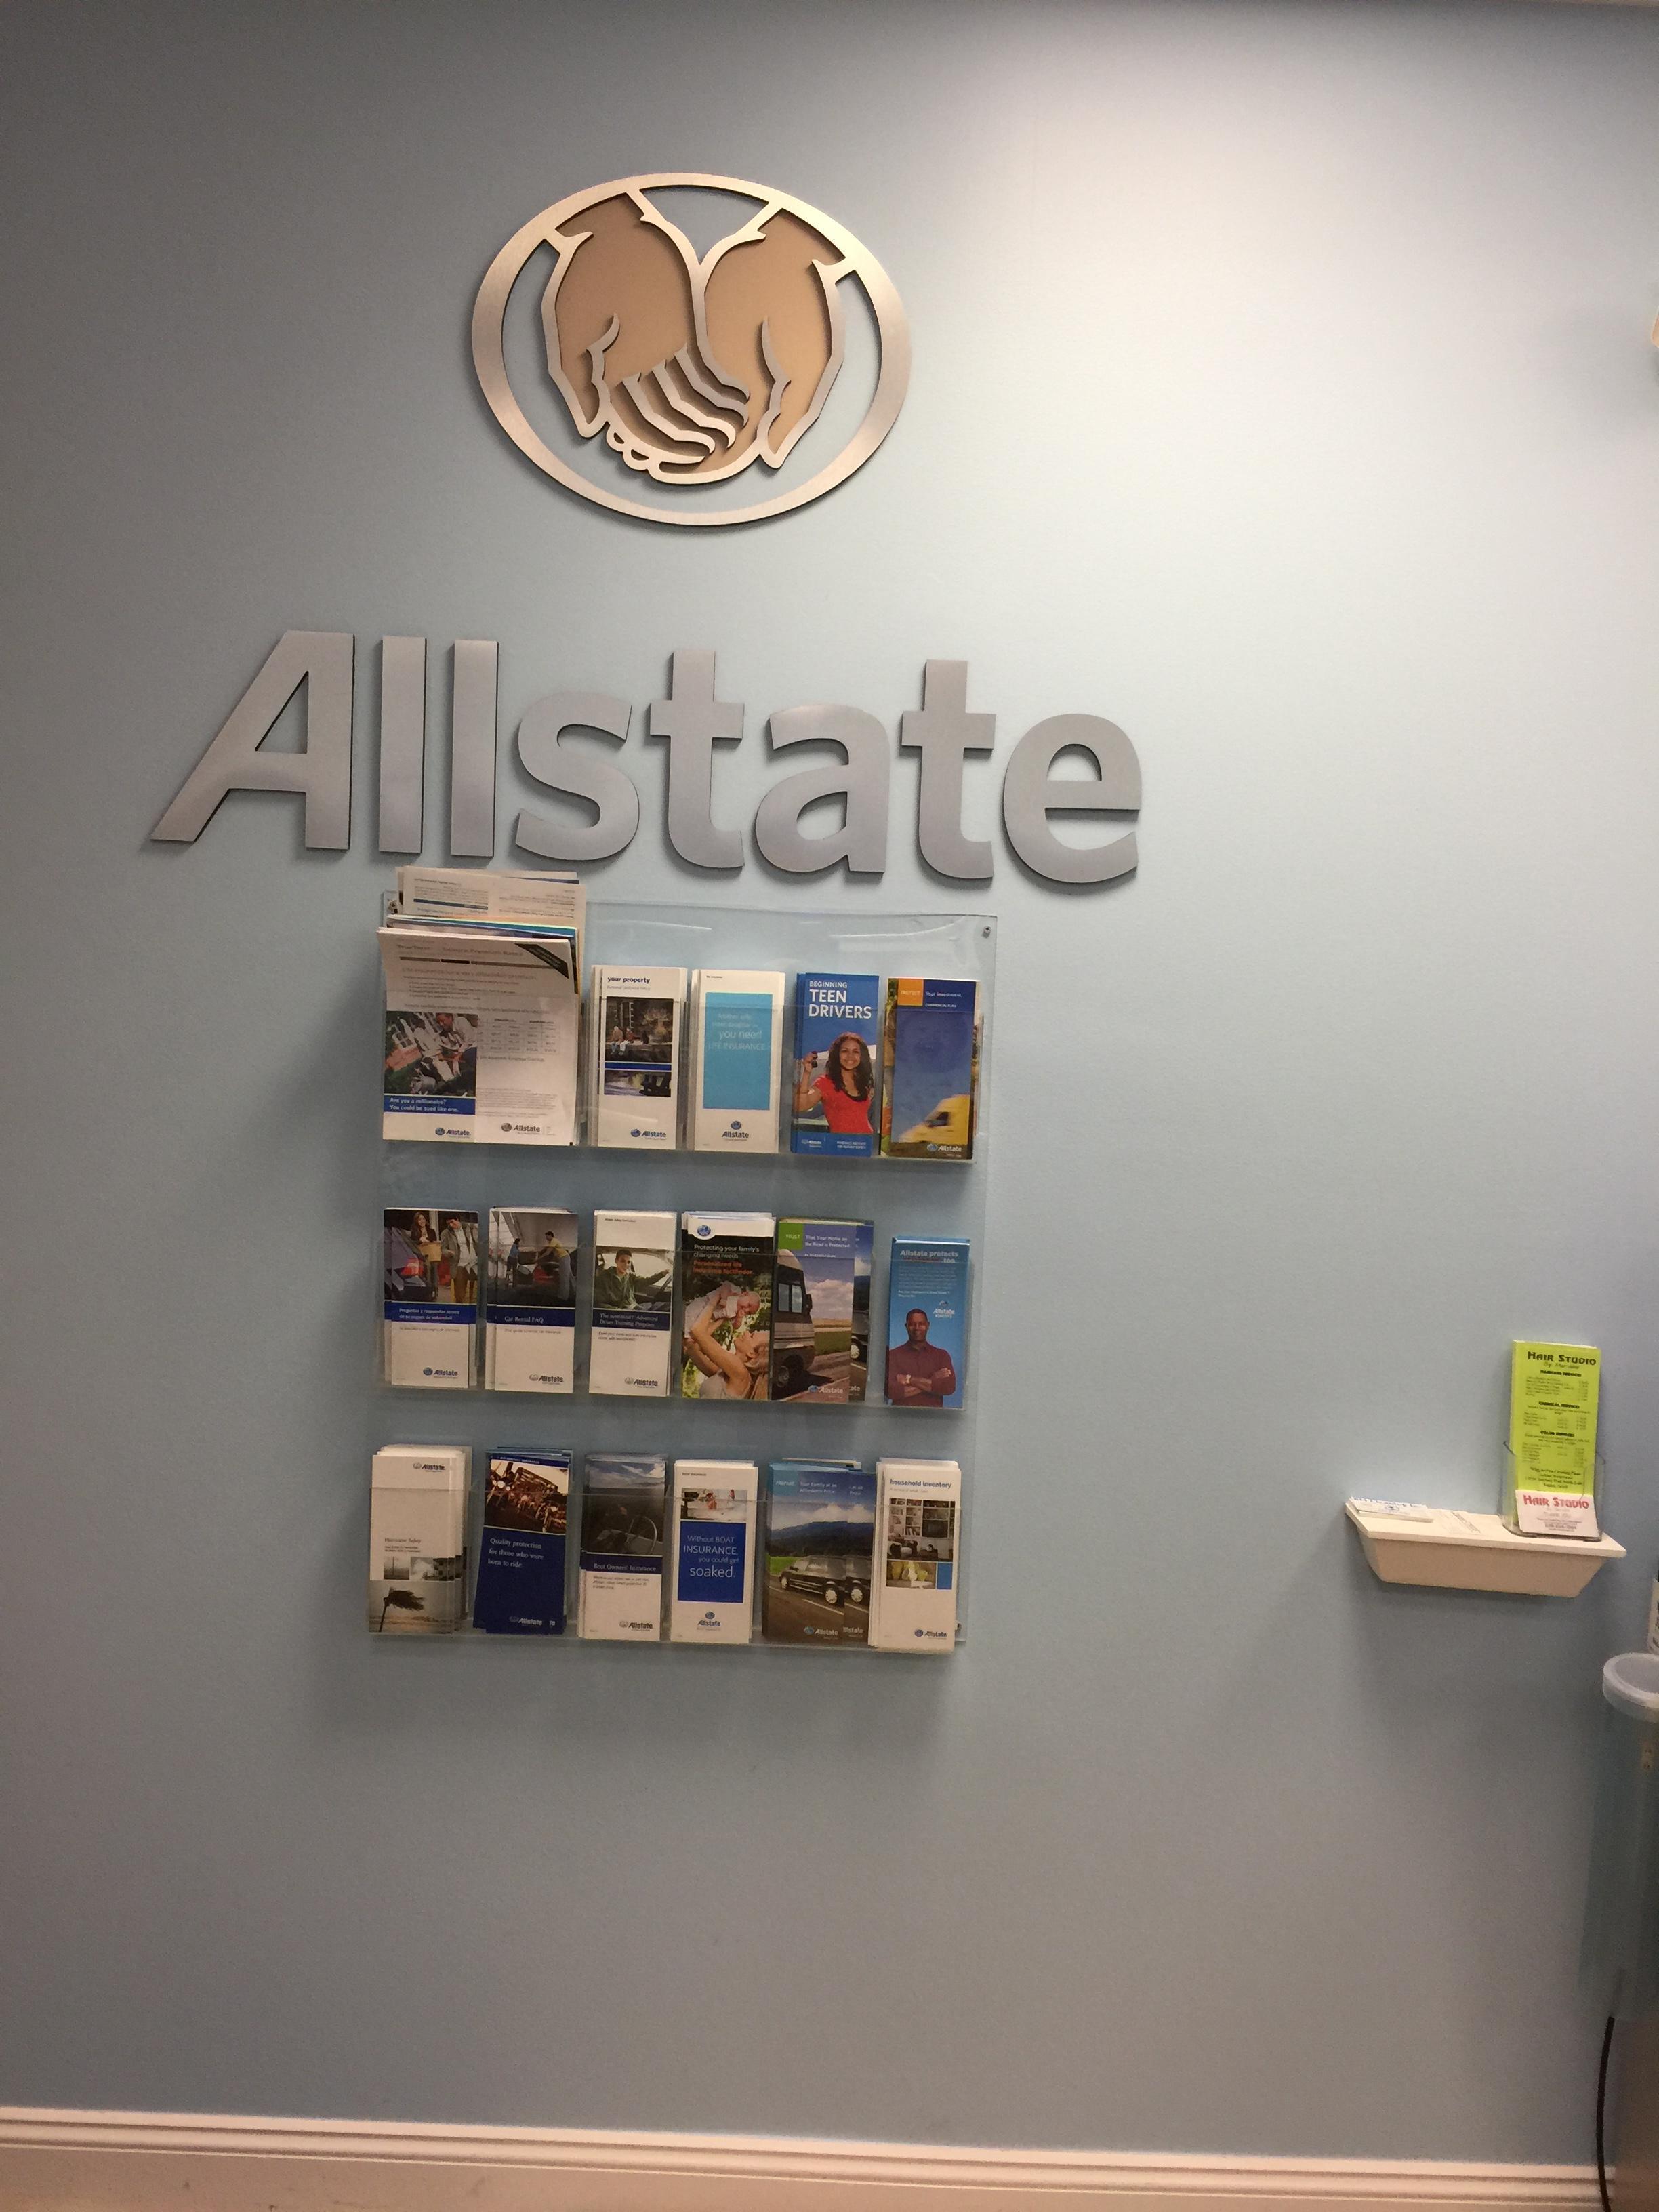 Belinda Malolli: Allstate Insurance image 6